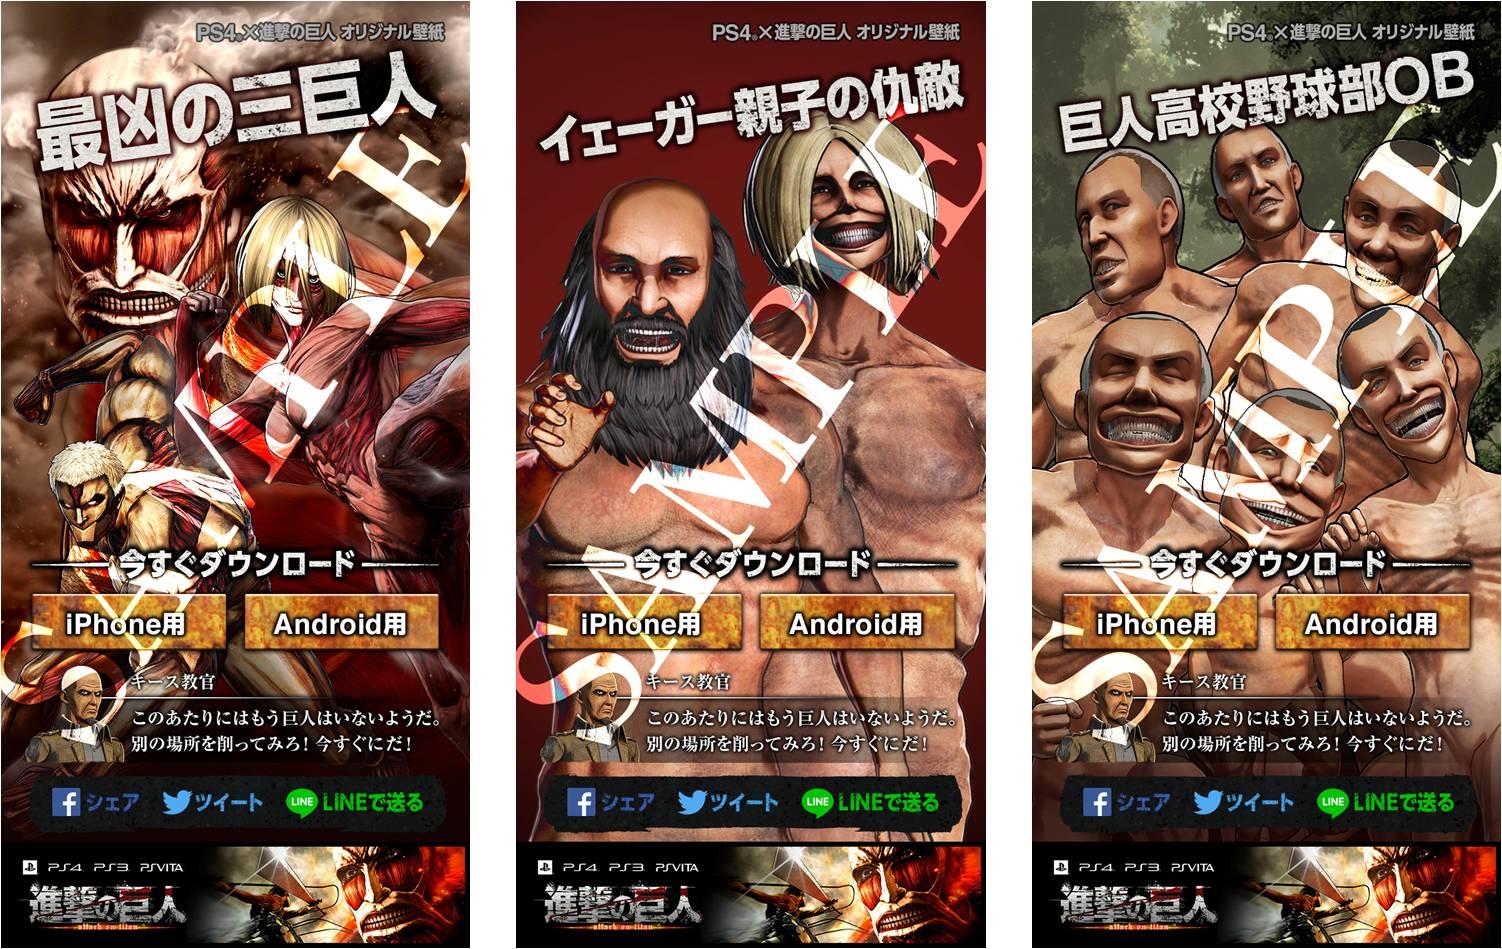 画像集 010 巨人が東京 大阪に再襲来 進撃の巨人 東西同時の